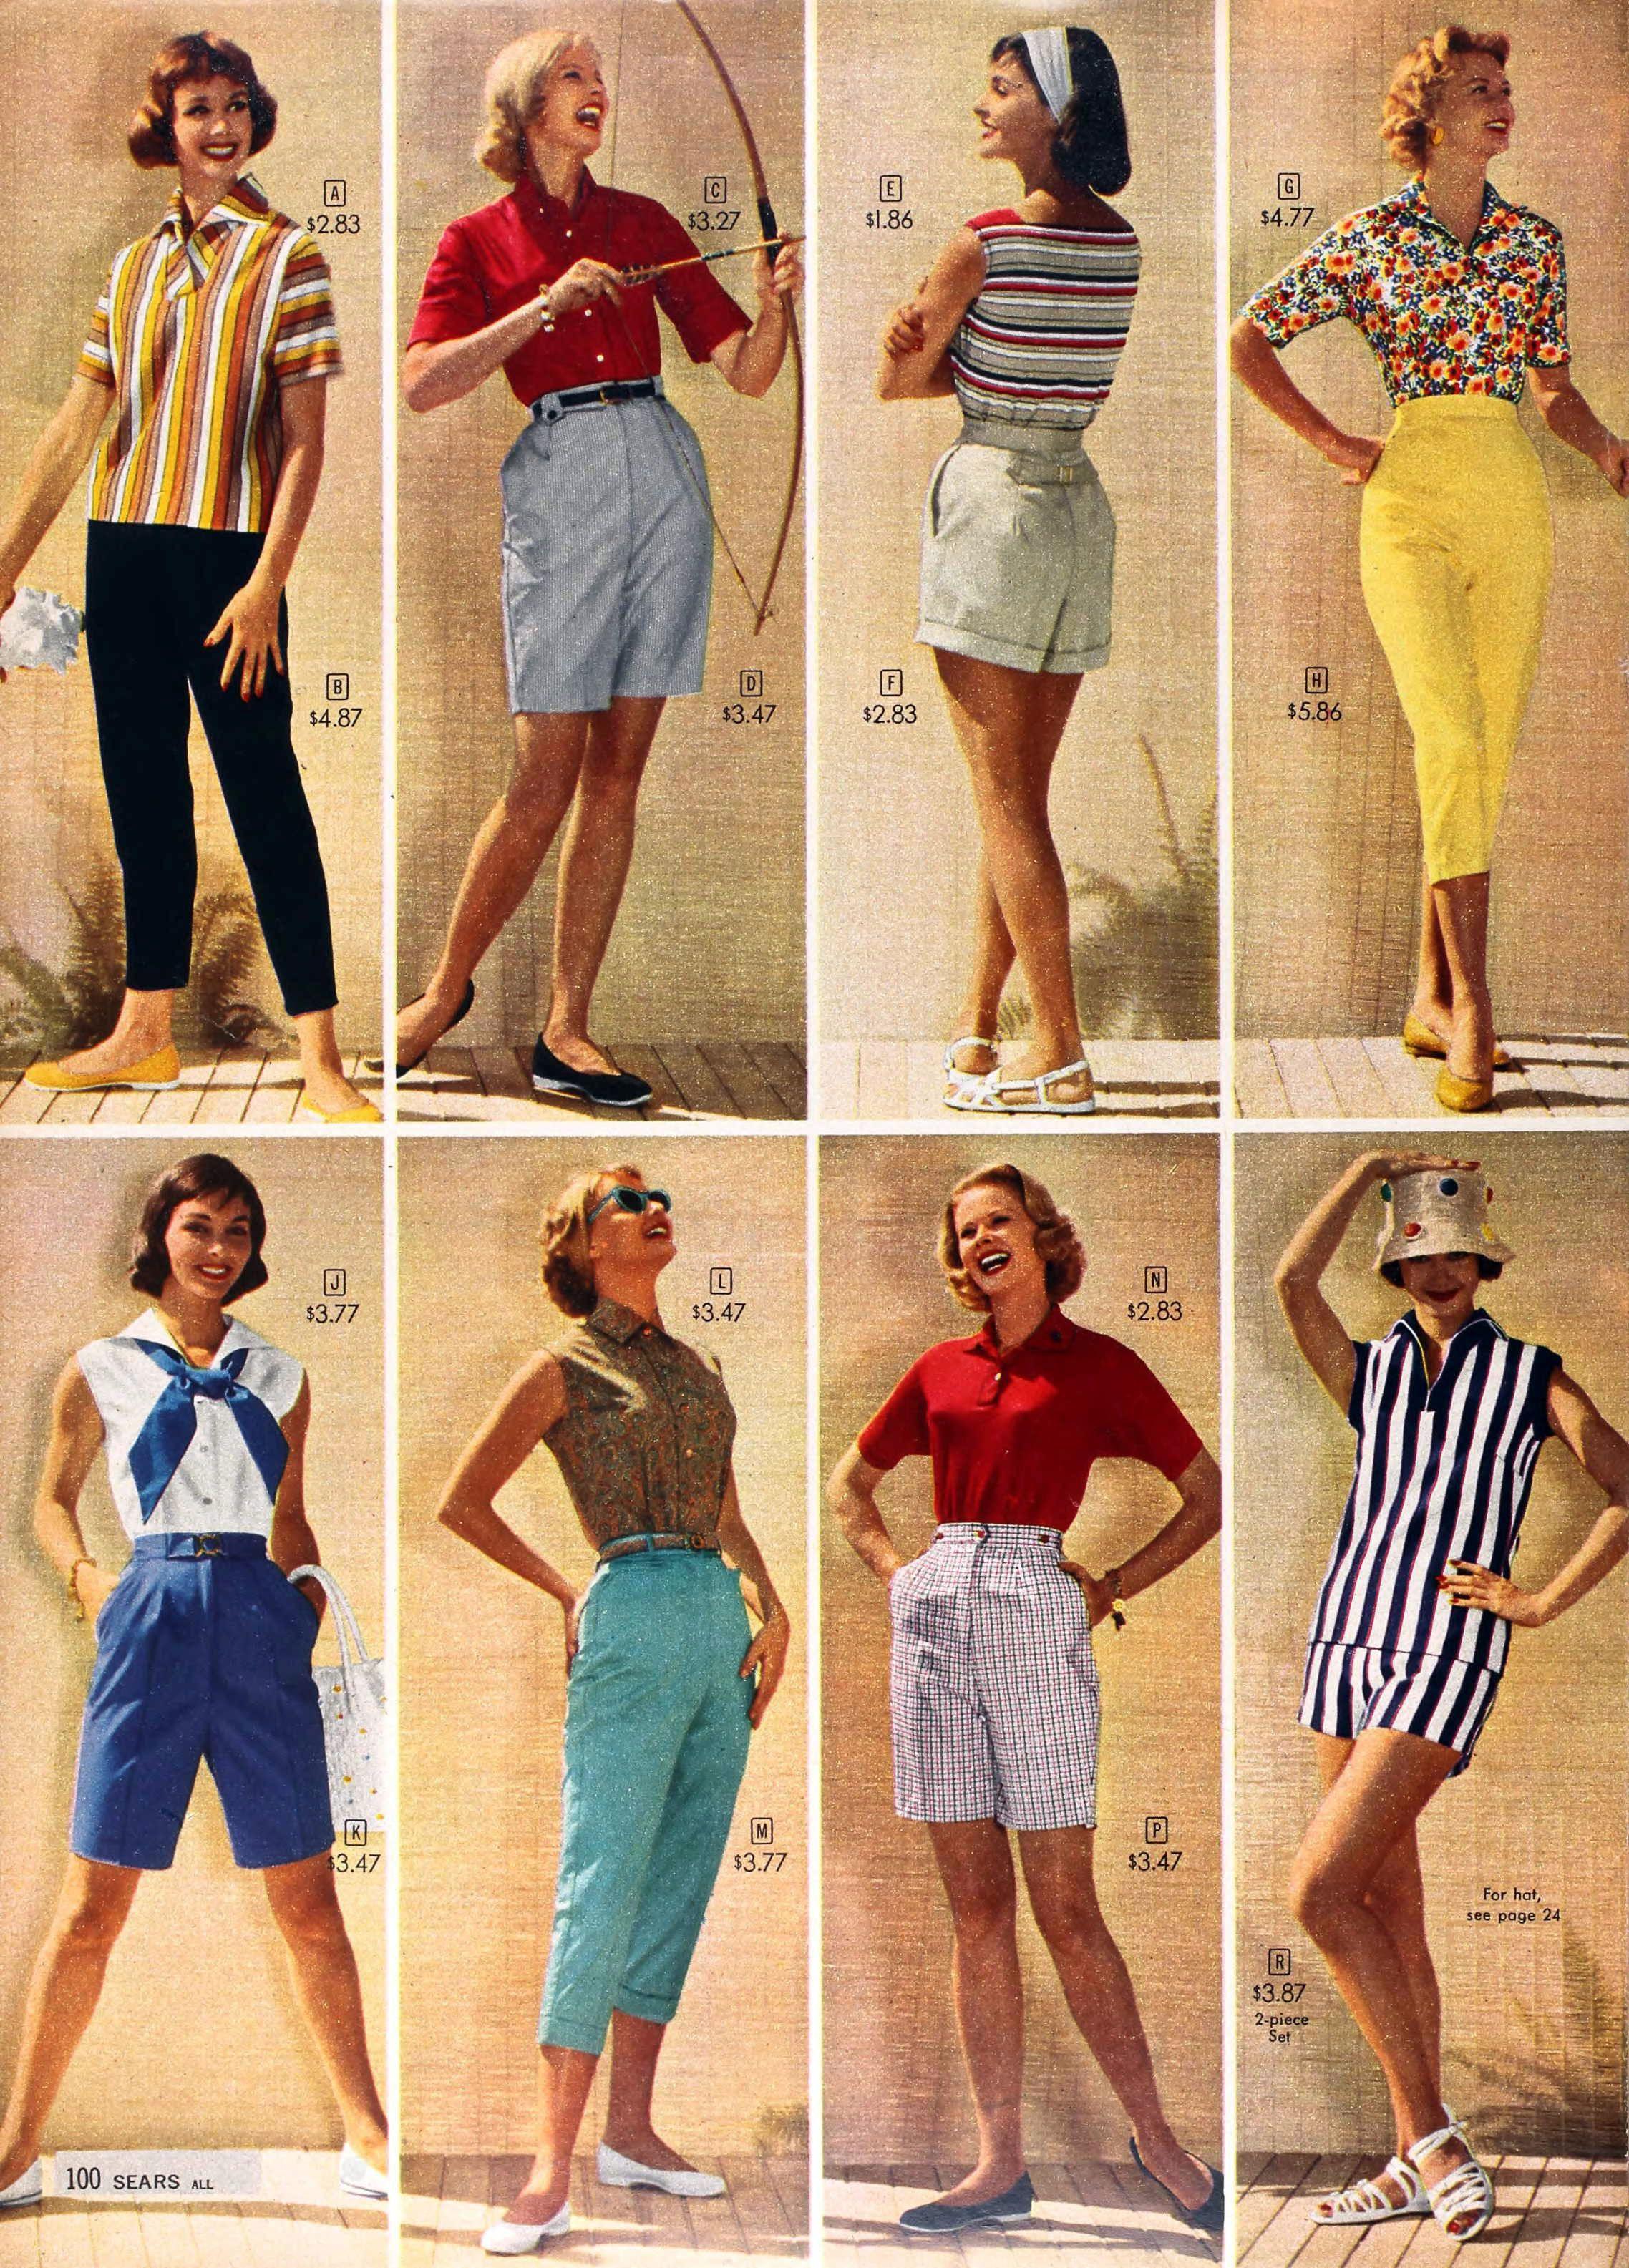 Sears Catalog, Spring/Summer 1958 - Women's Fashion | 1950s Fresh ...